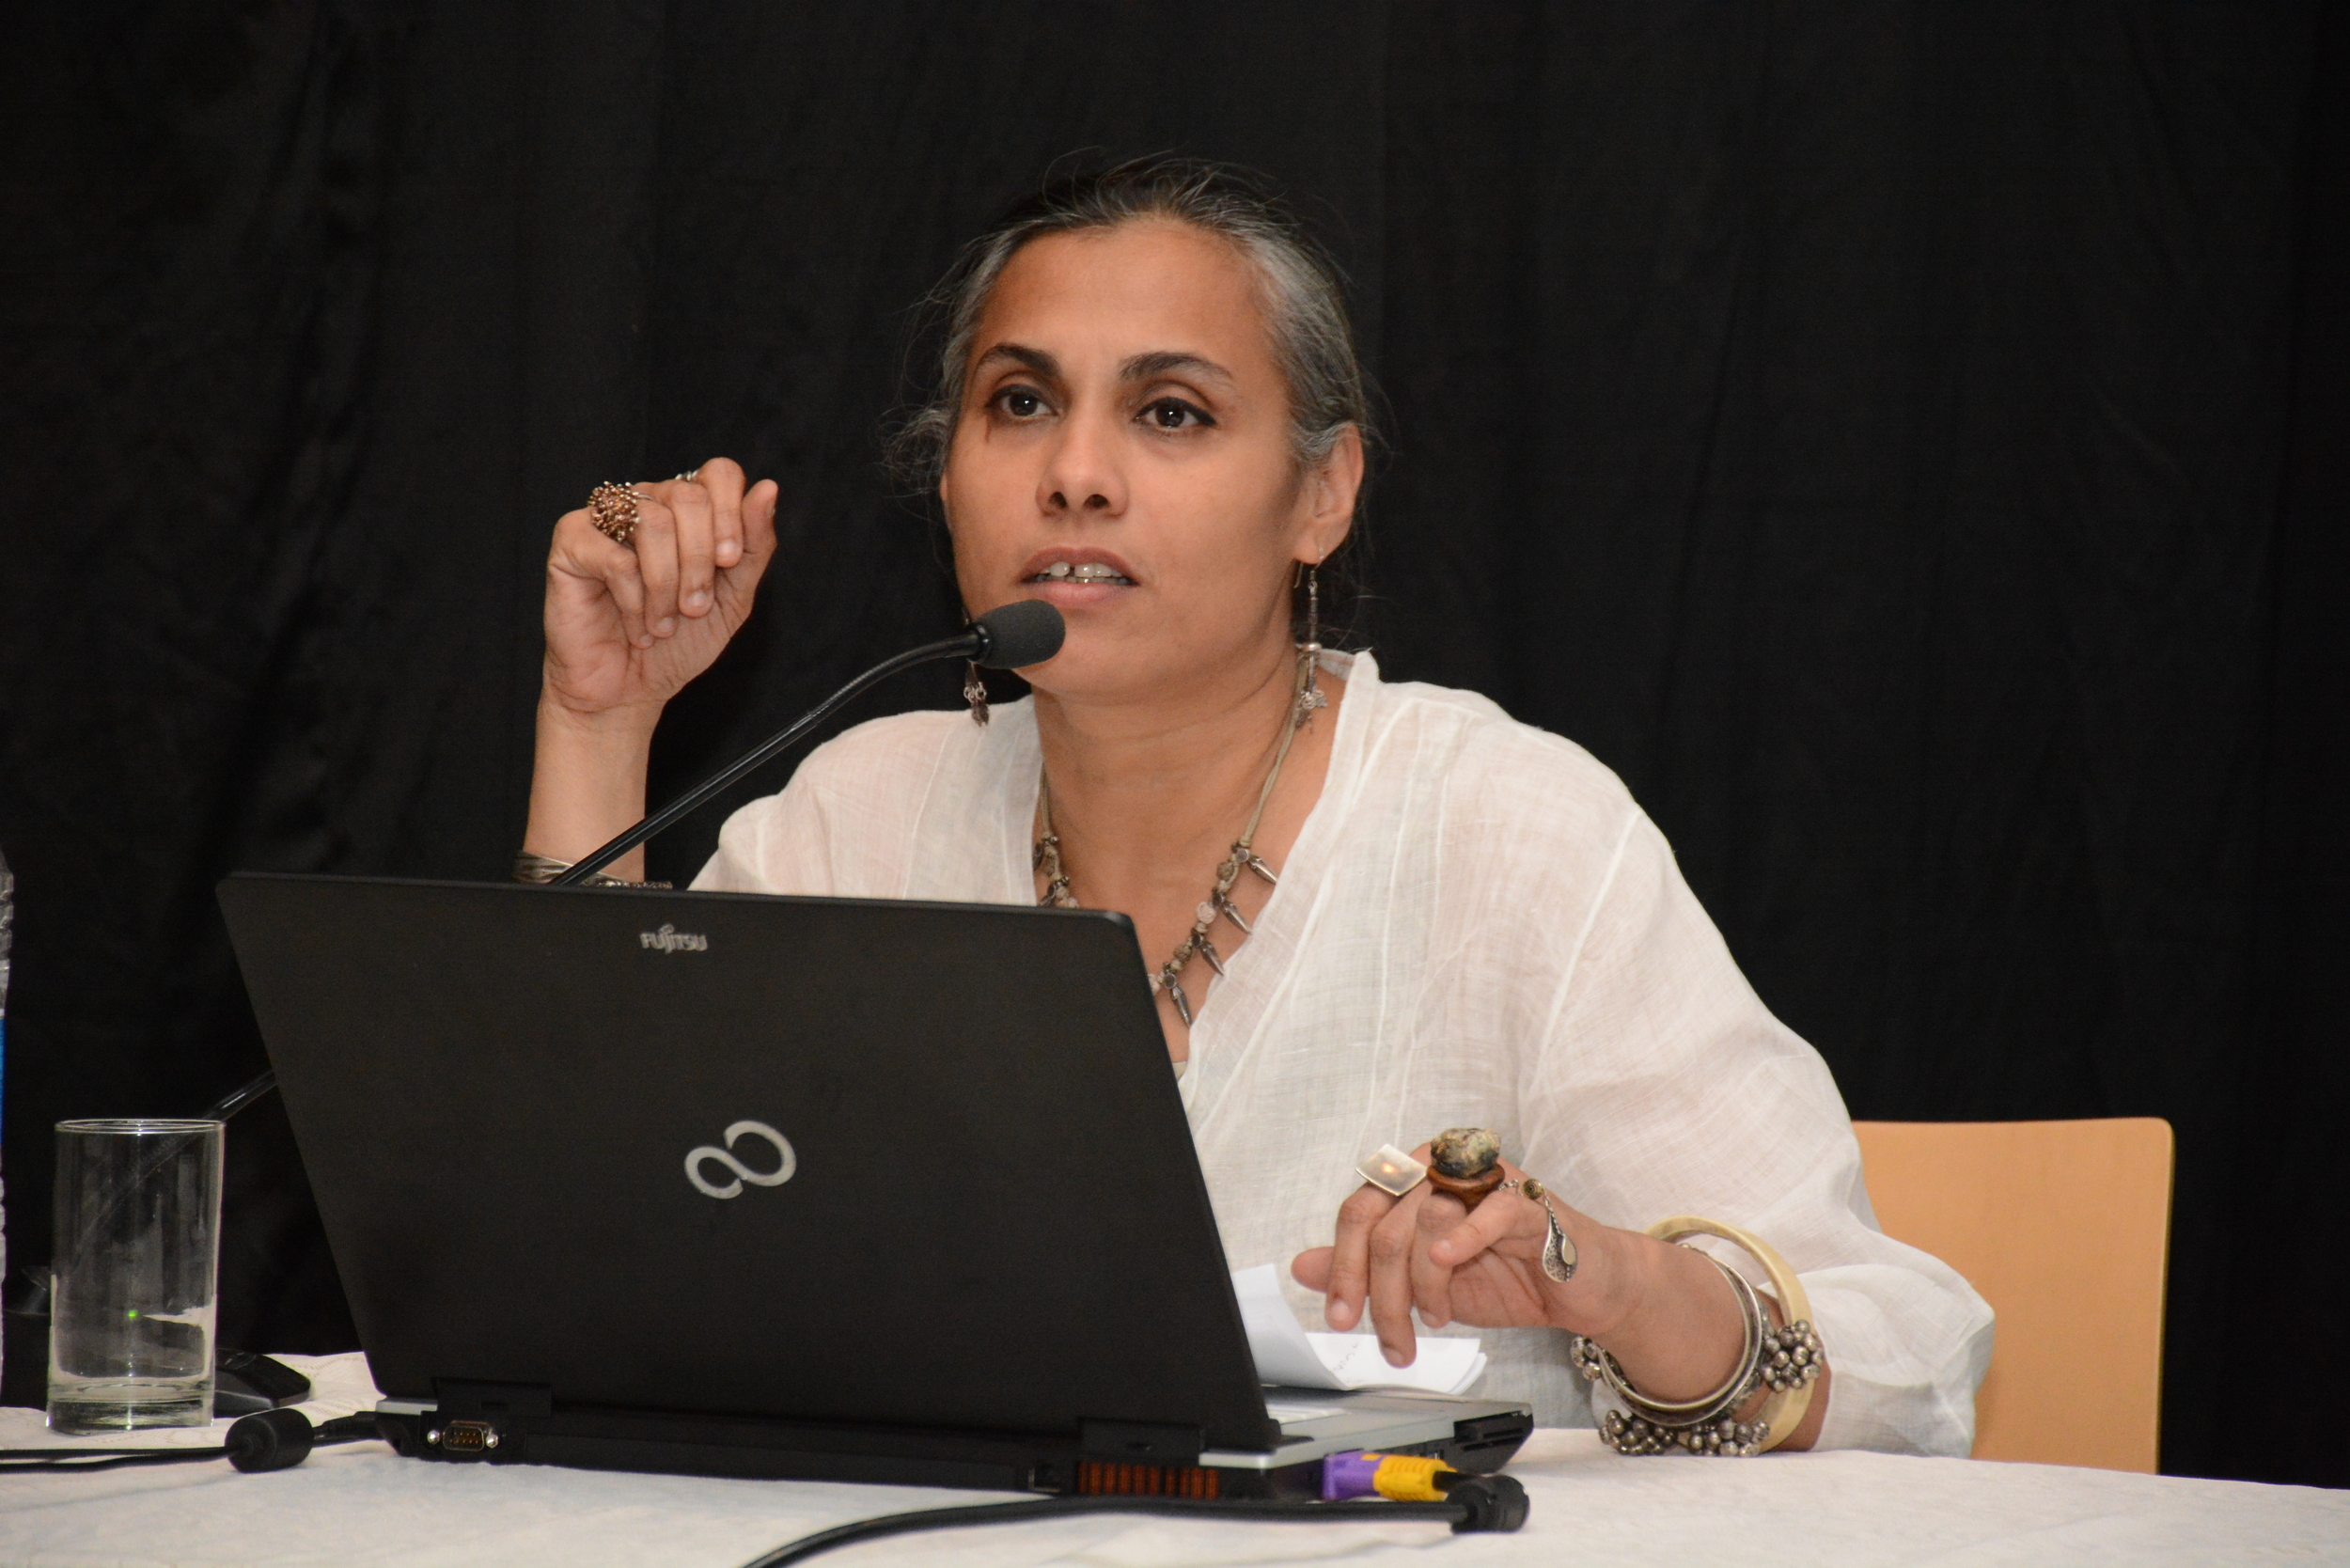 Panel 2: Speaker: Sharmila Samant